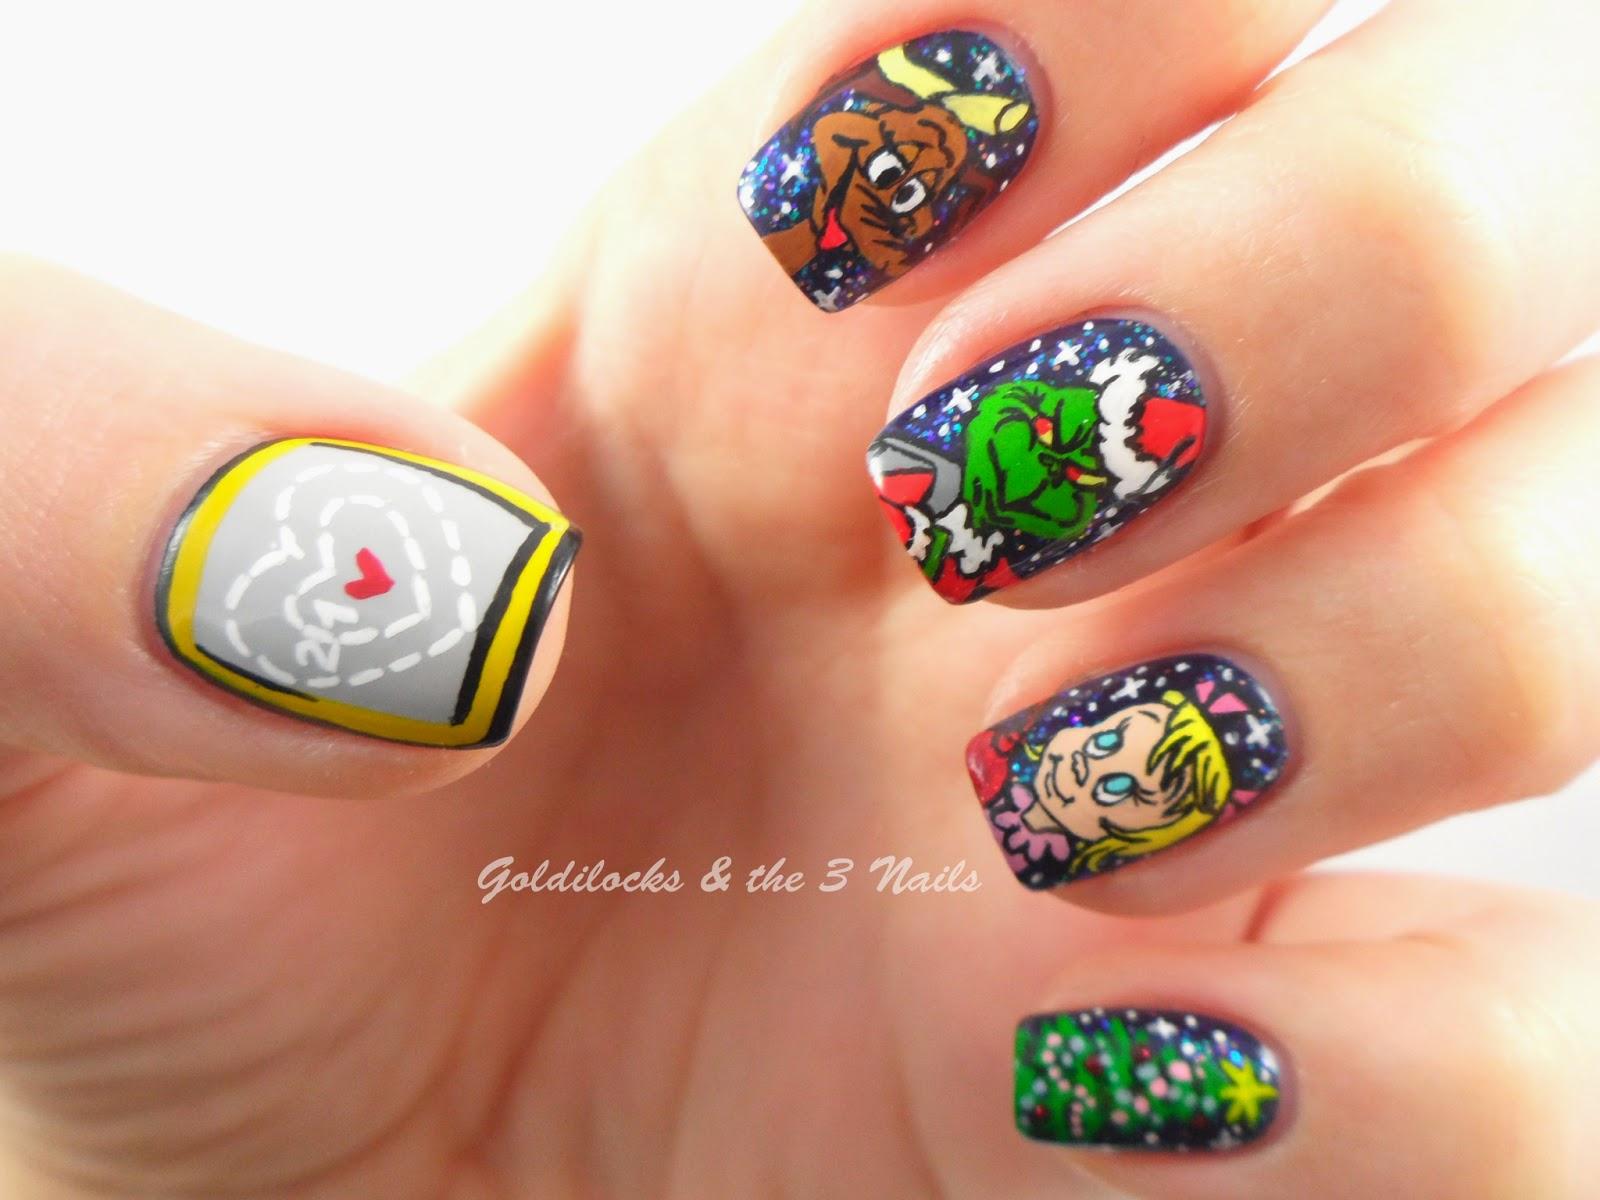 Goldilocks & the Three Nails: How the Grinch Stole Christmas Nail Art